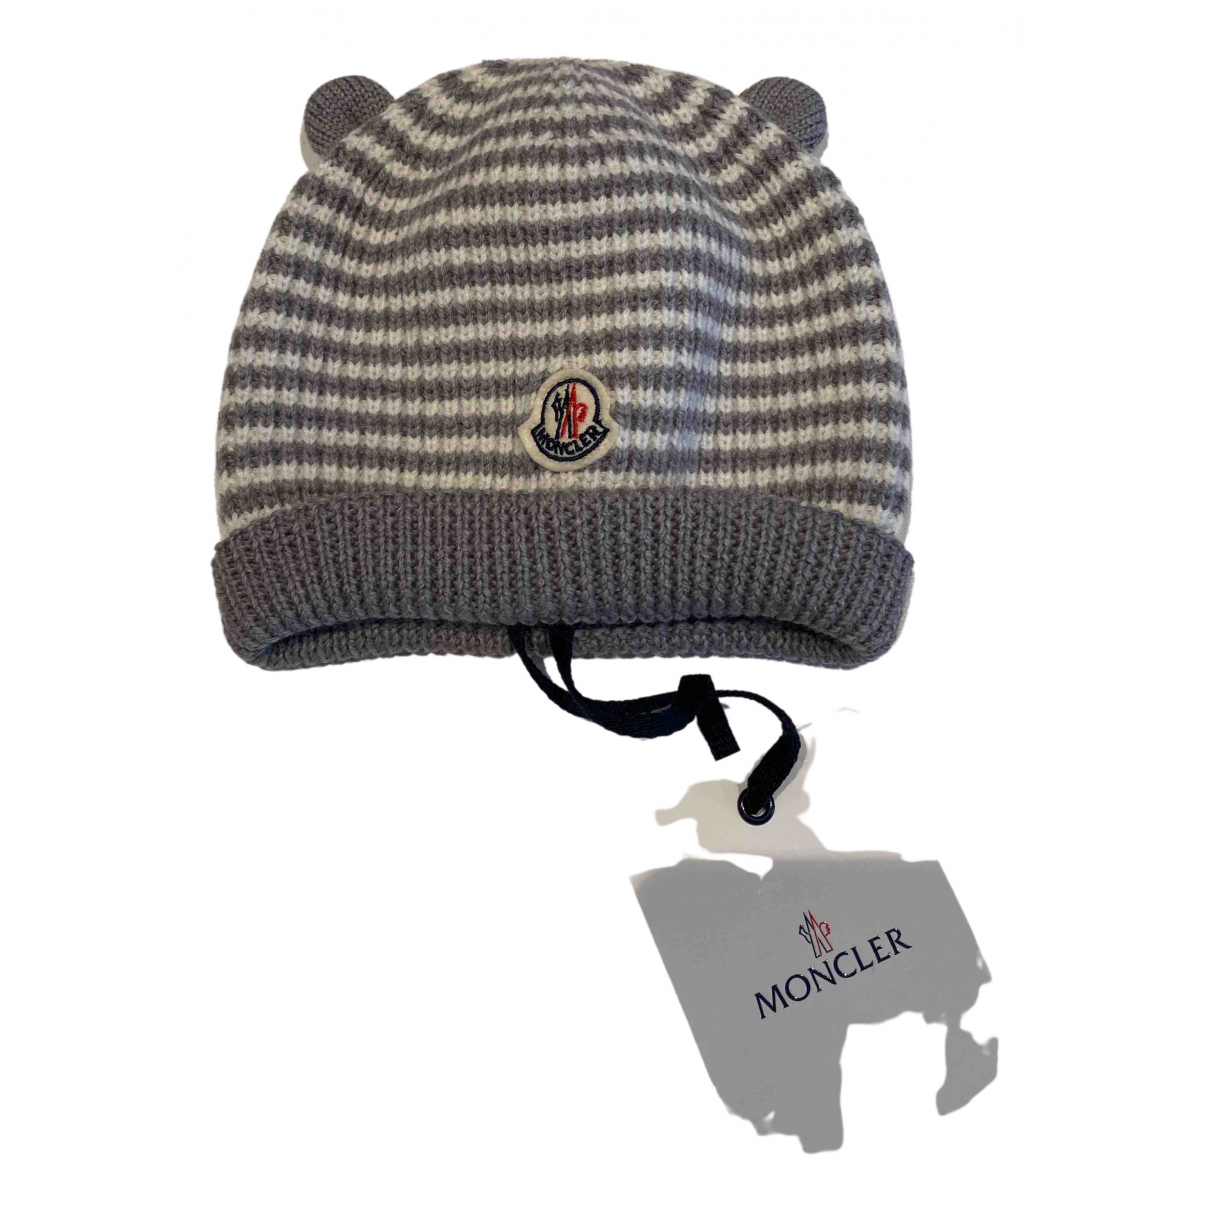 Moncler N Grey Wool hat & Gloves for Kids N